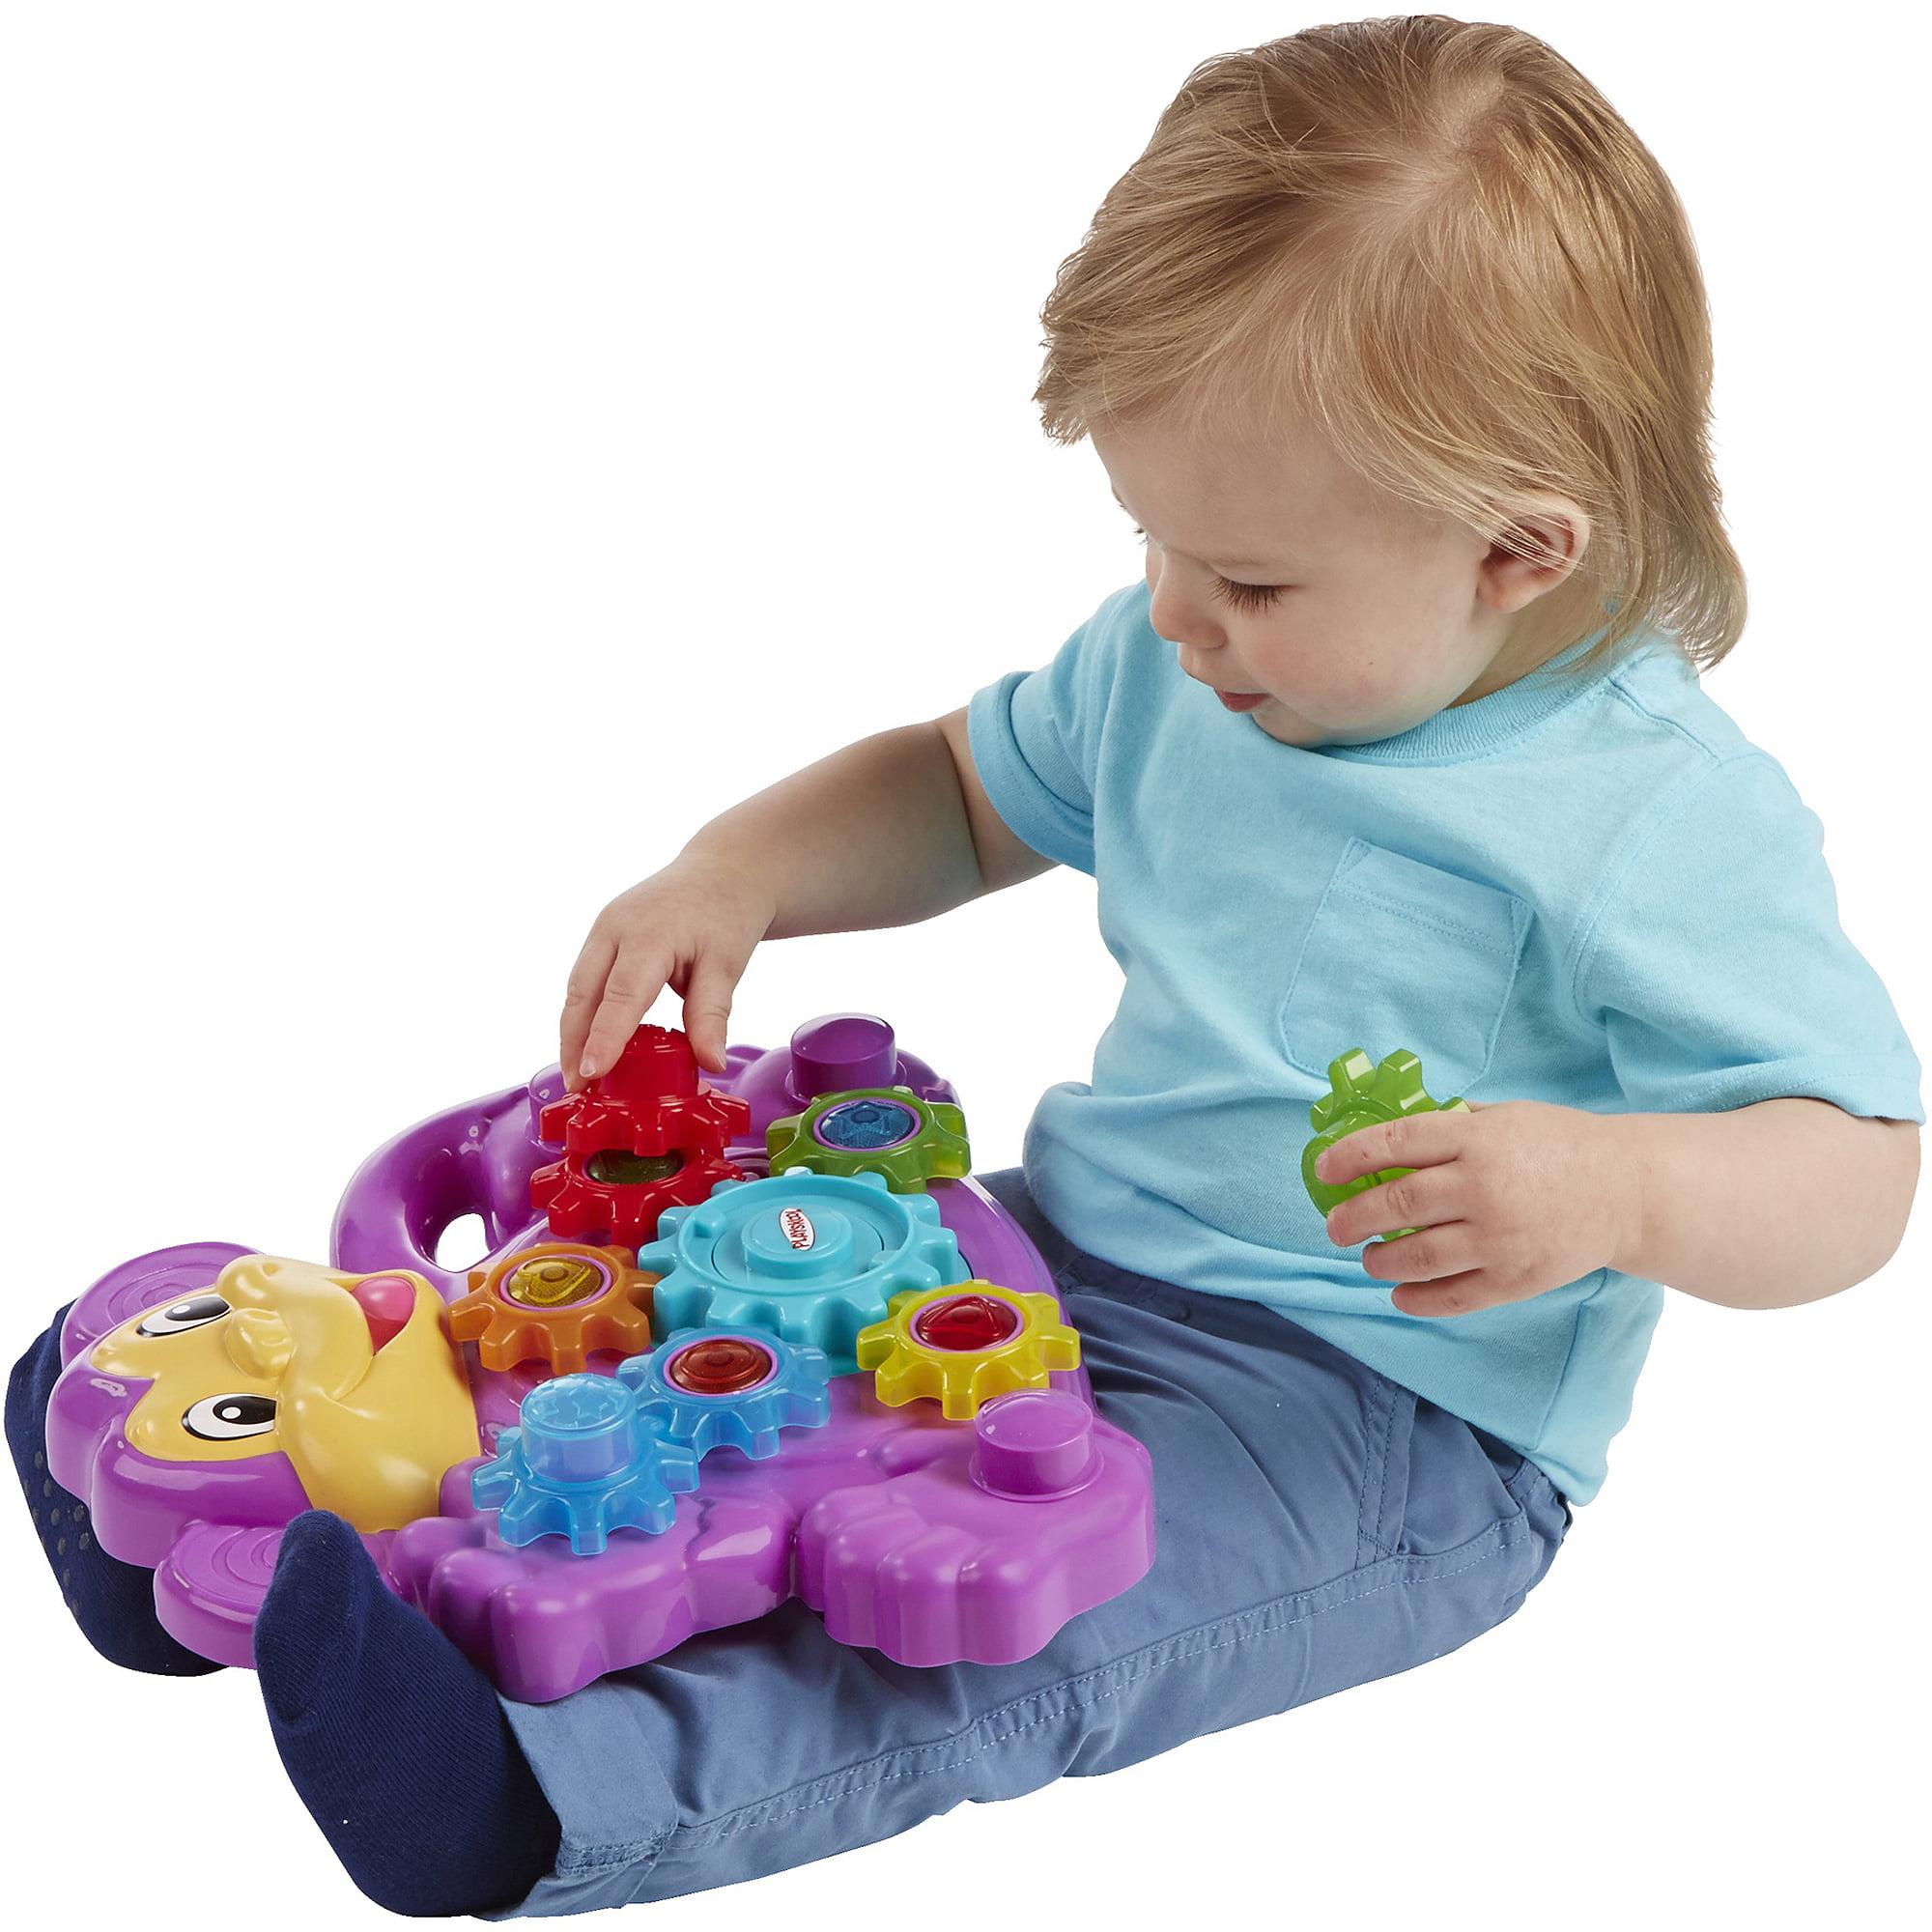 Perfect Baby Gears Toy Gift Bathtub Ideas